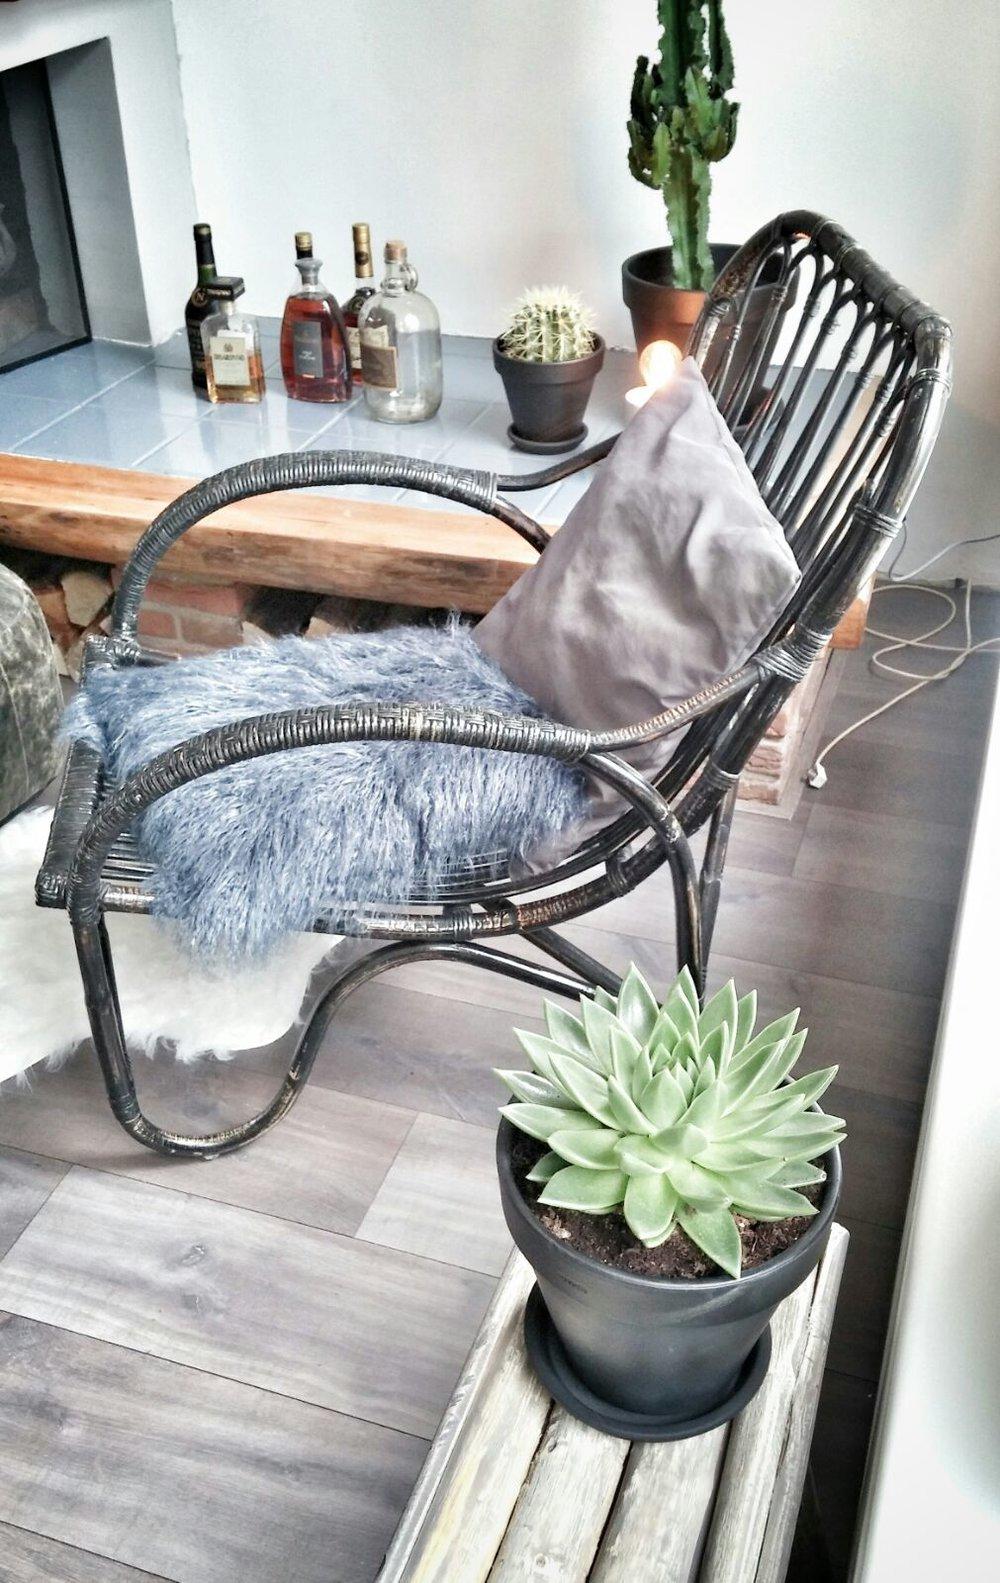 woonkamer interieurstyling industrieel stoer accessoires plant groen vacht rieten stoel schouw open haard.jpg